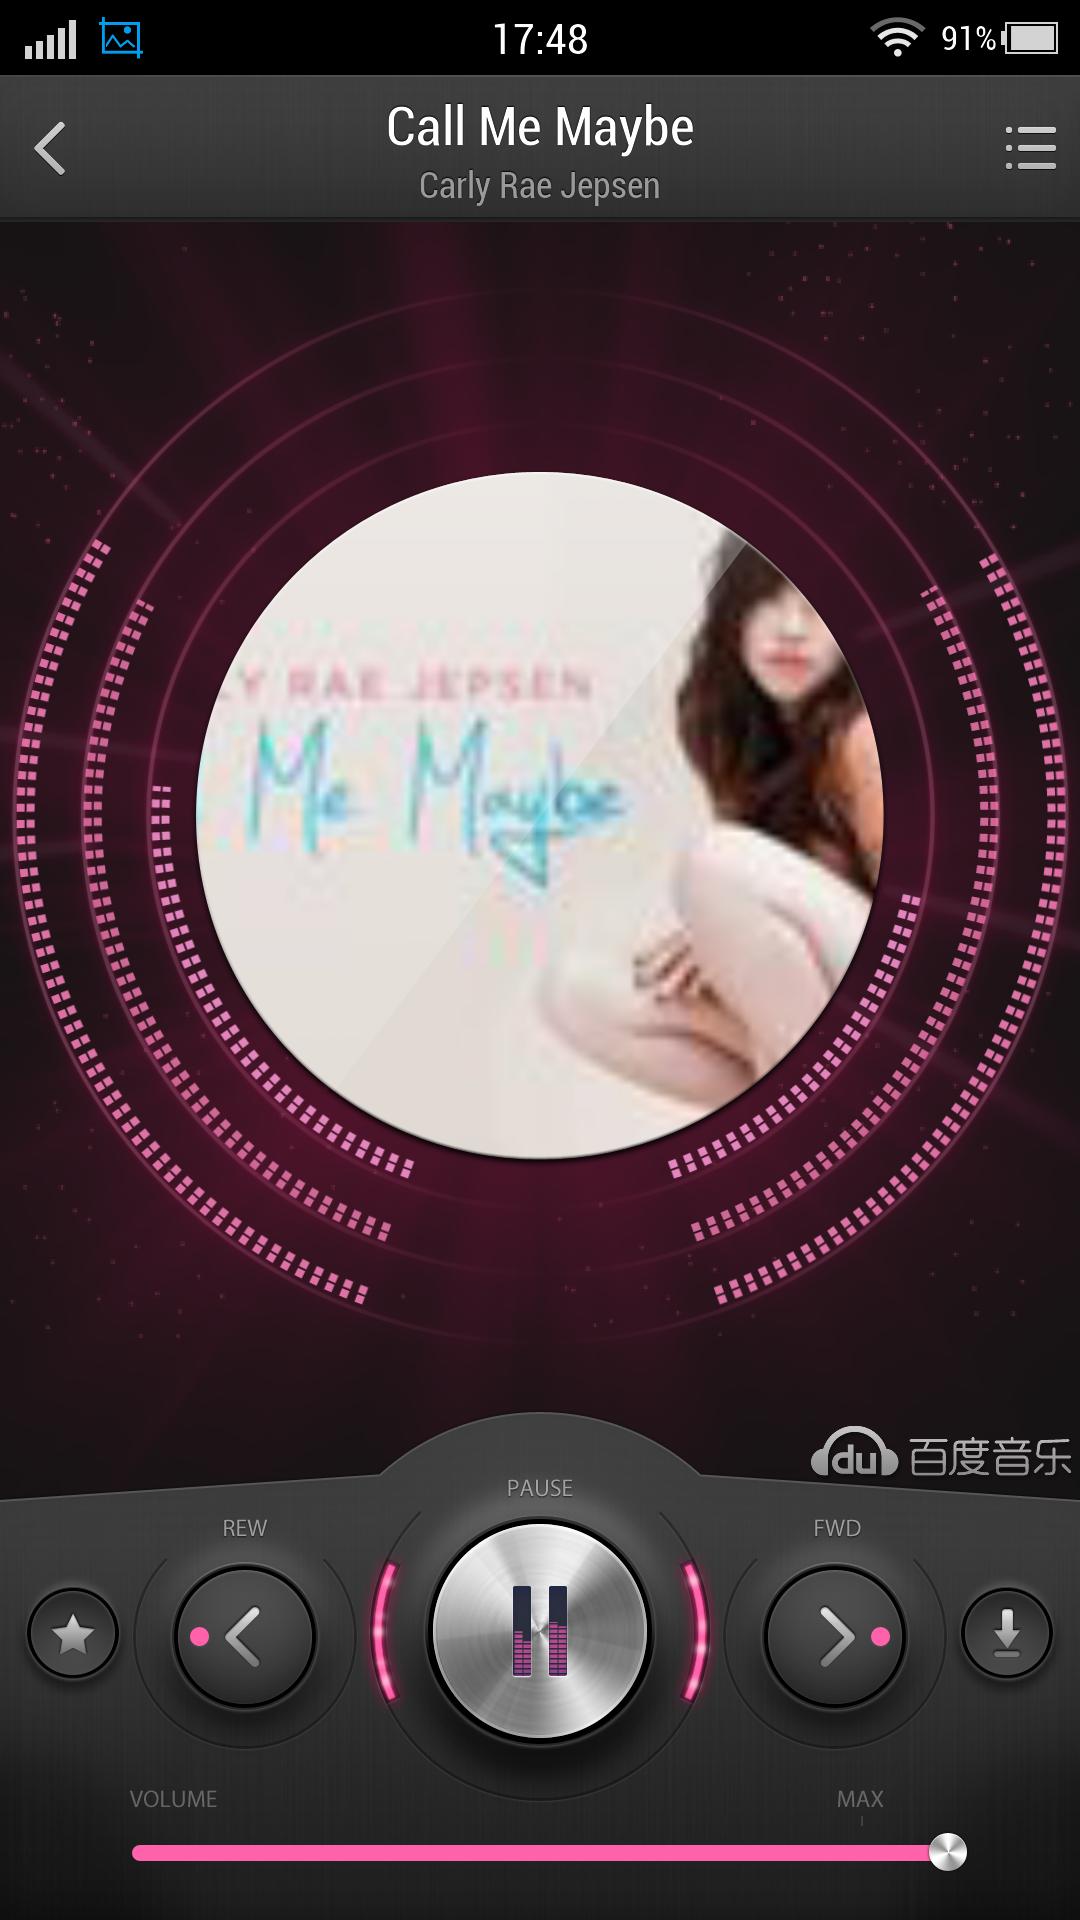 Xplay iMusic music player | Chinese Tech